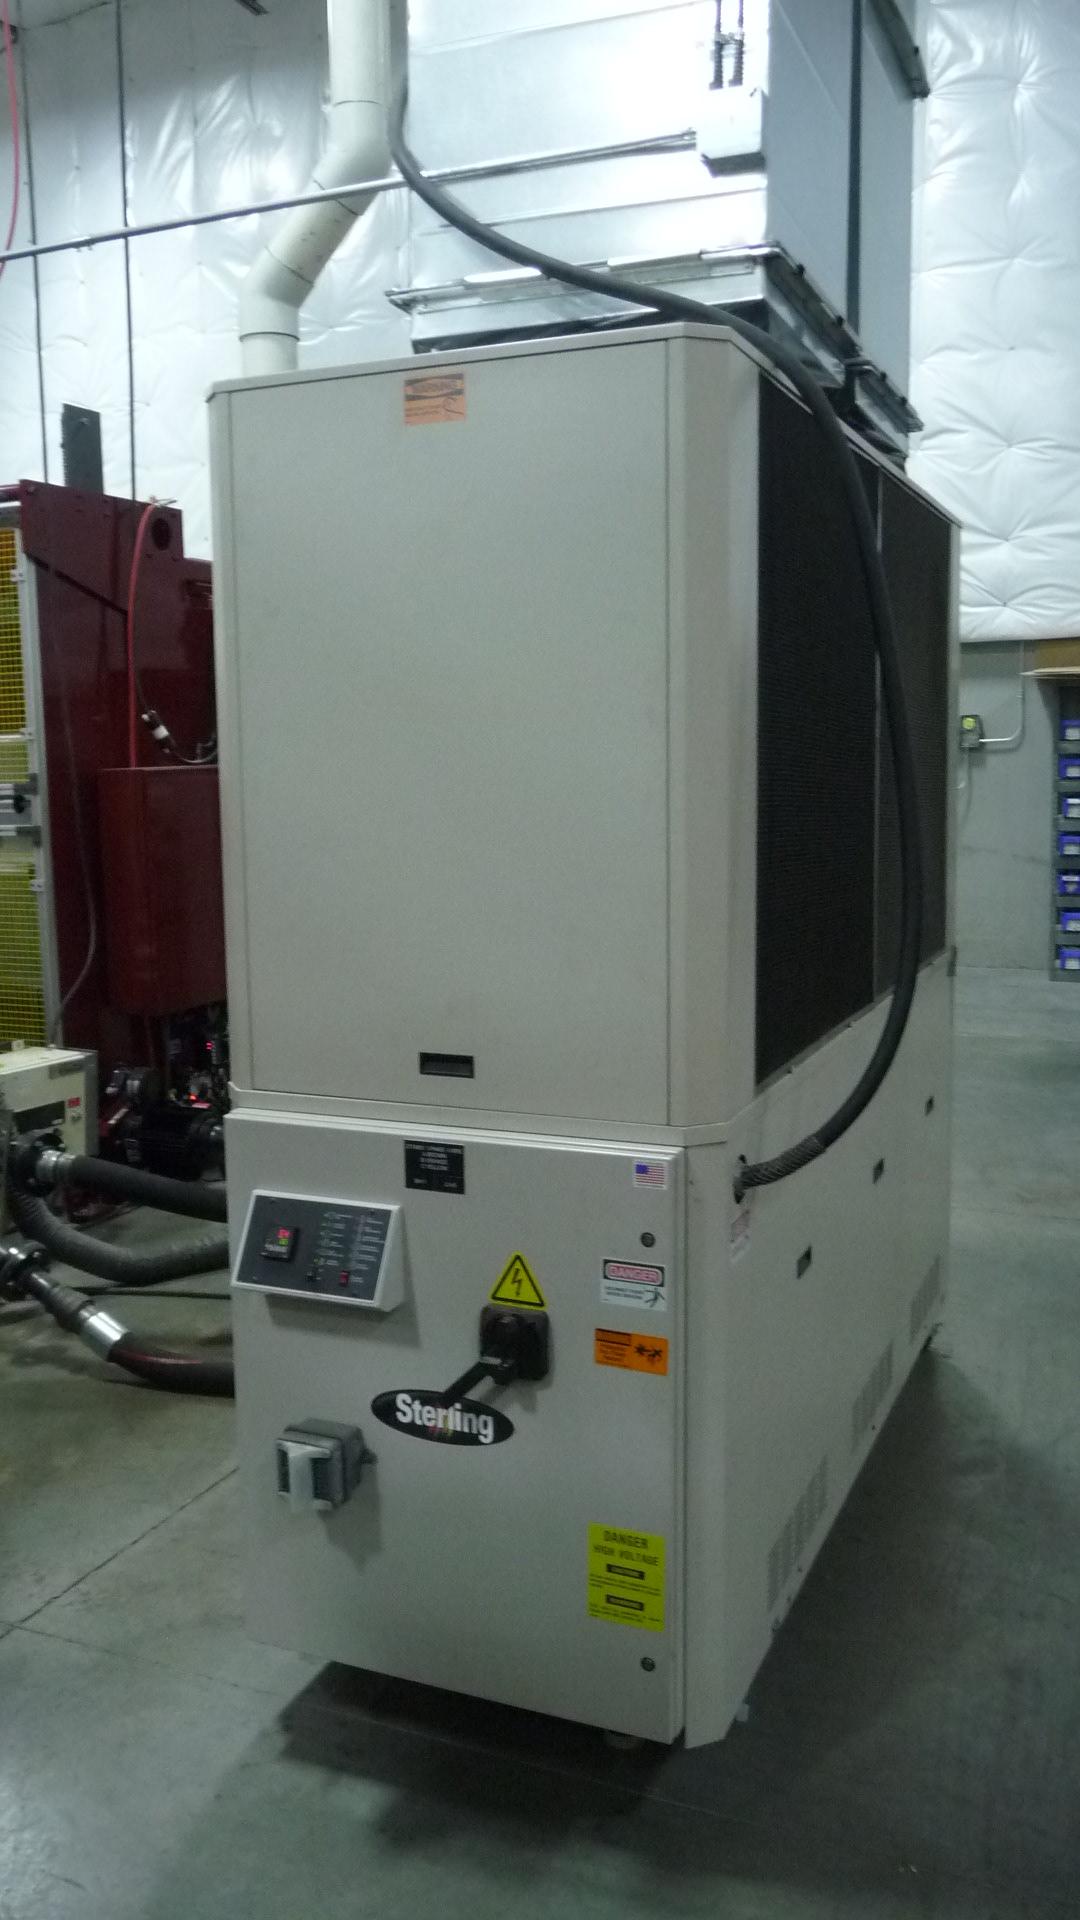 Comco Proglide MSP - Used Flexo Printing Presses and Used Flexographic Equipment-6